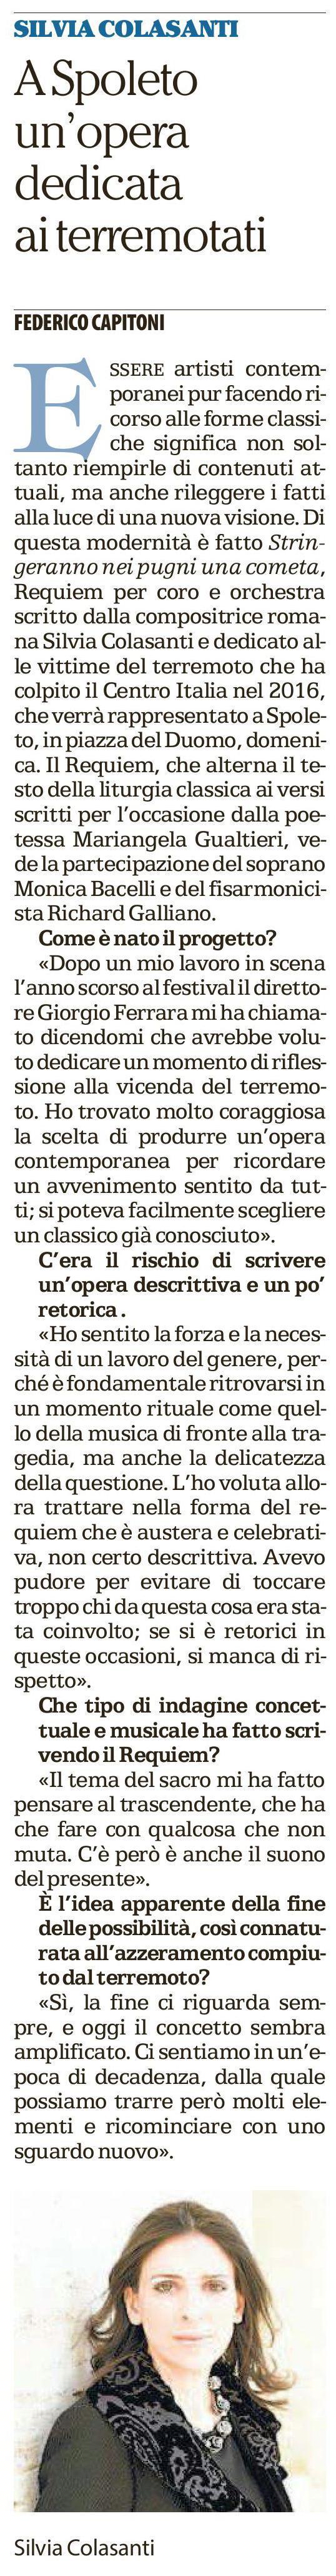 La Repubblica - Requiem